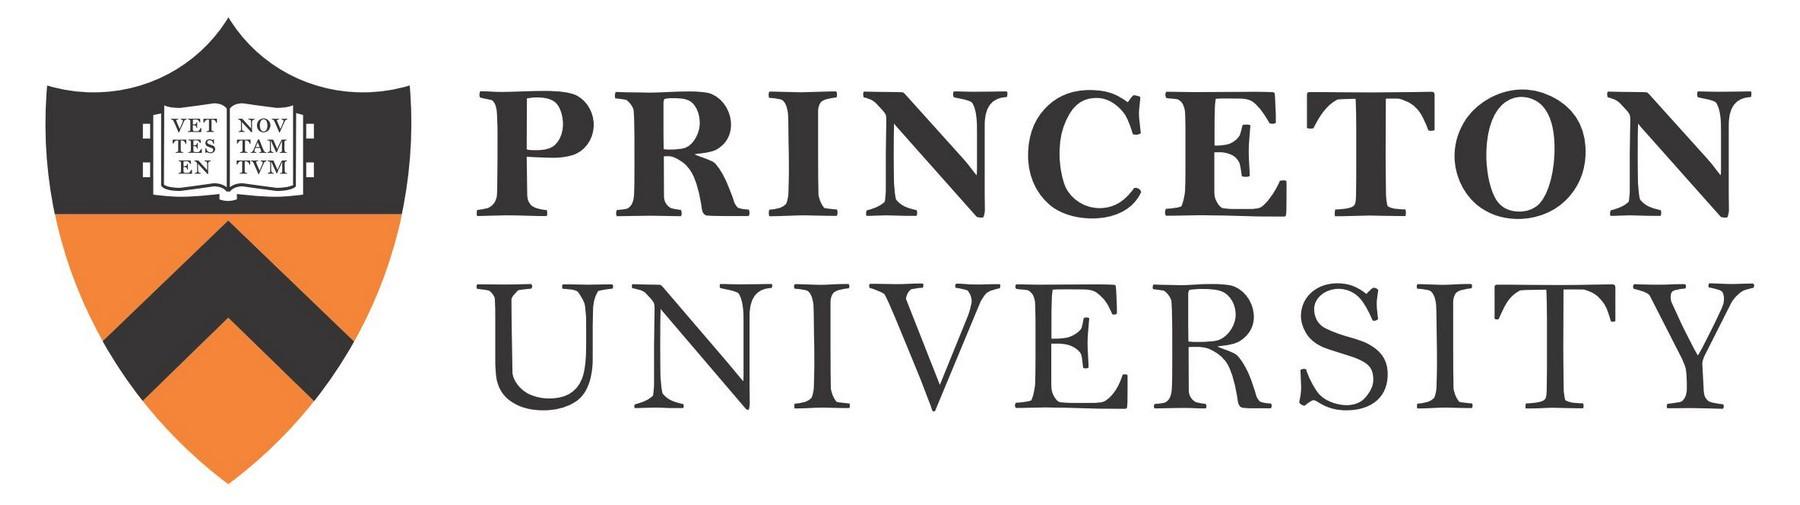 Princeton University Logo Vector PNG